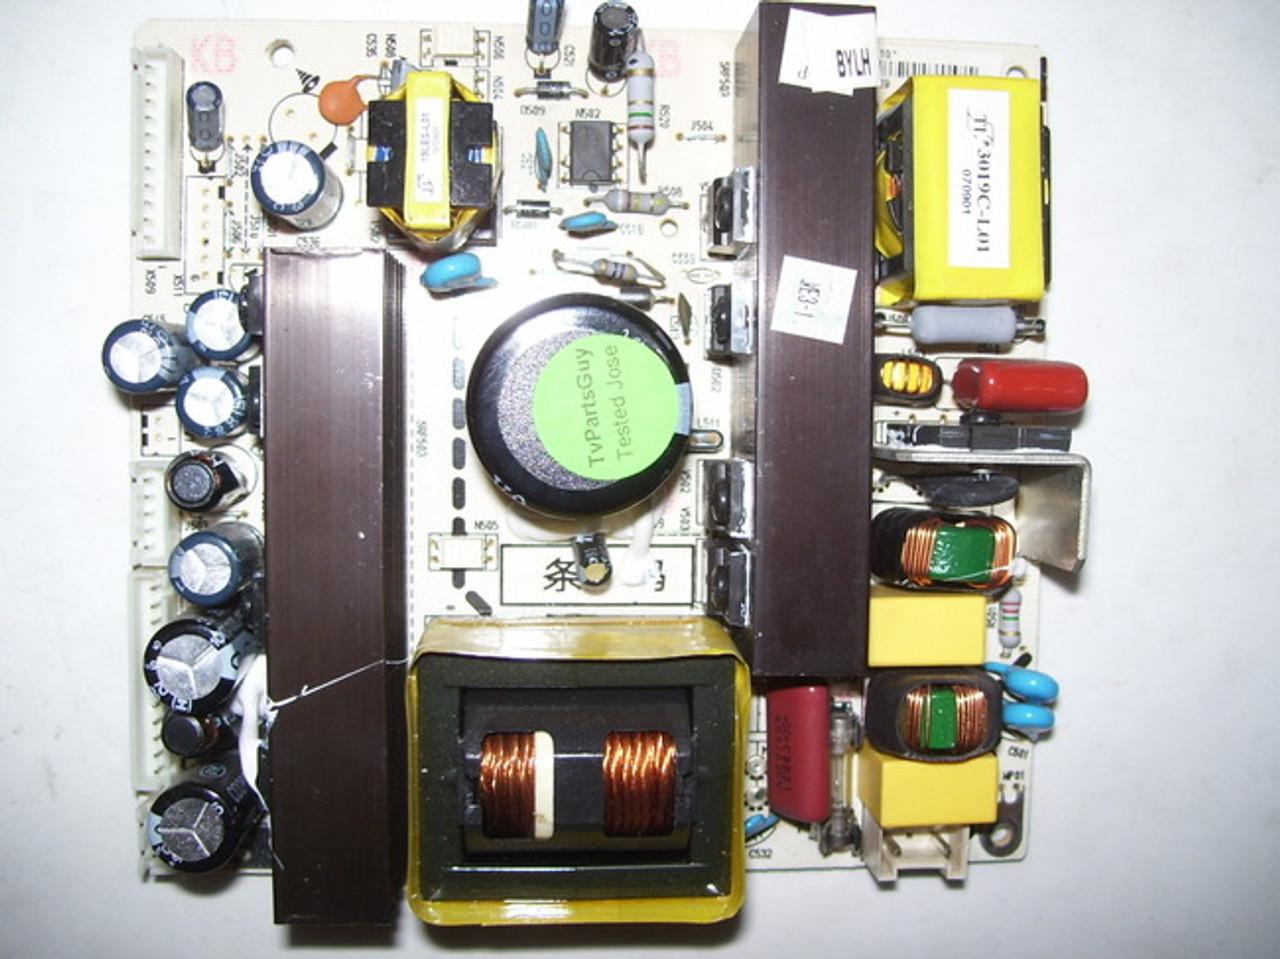 INSIGNIA POWER SUPPLY BOARD 782.27HU25-200C / 6HA0082010